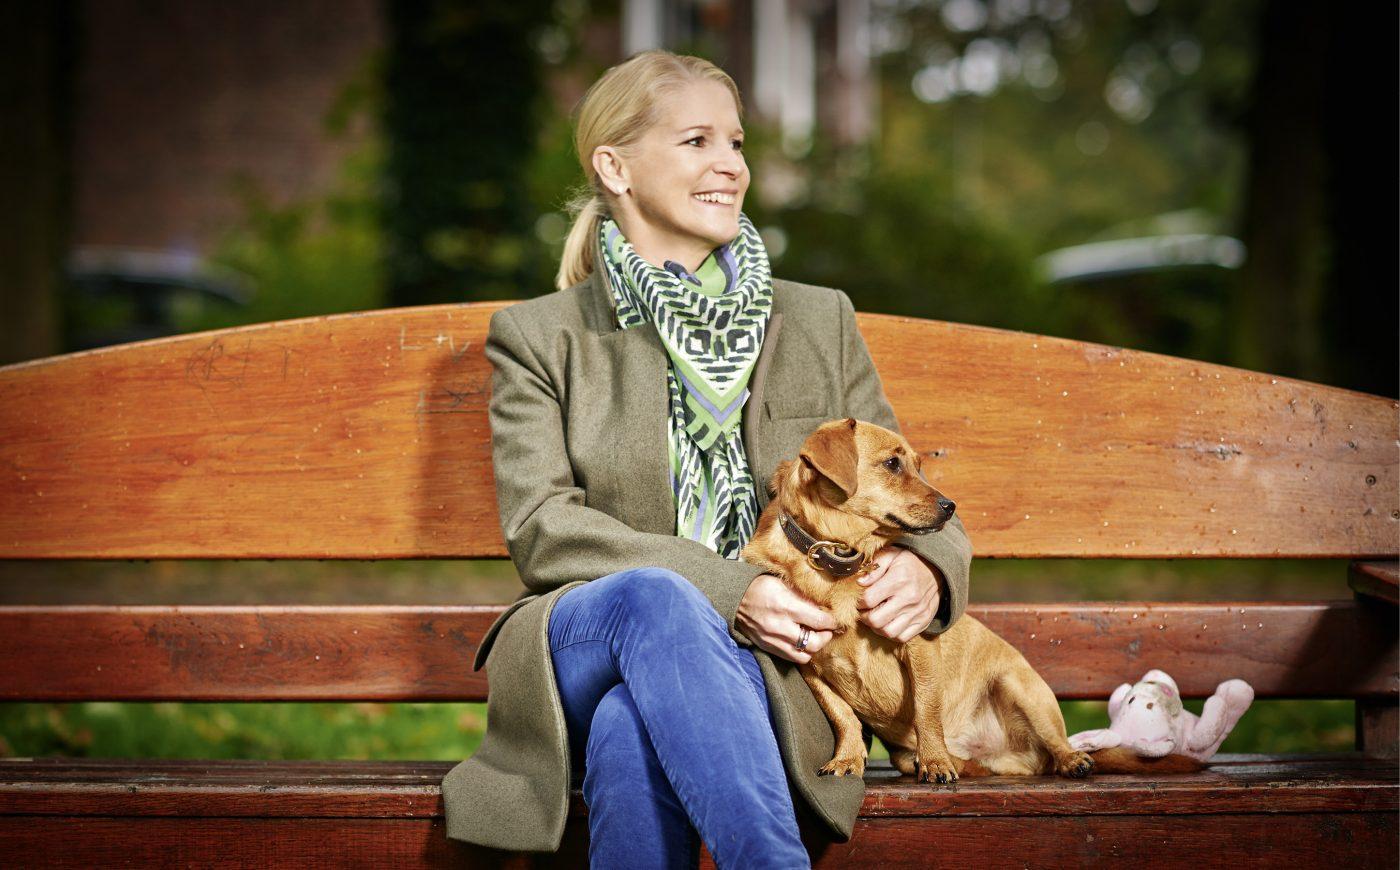 Cornelia-poletto-mit-hund-fuer-charity-buch-prominent-mit-hund-foto-nikolaj-georgiew-www.ciaogianna.de